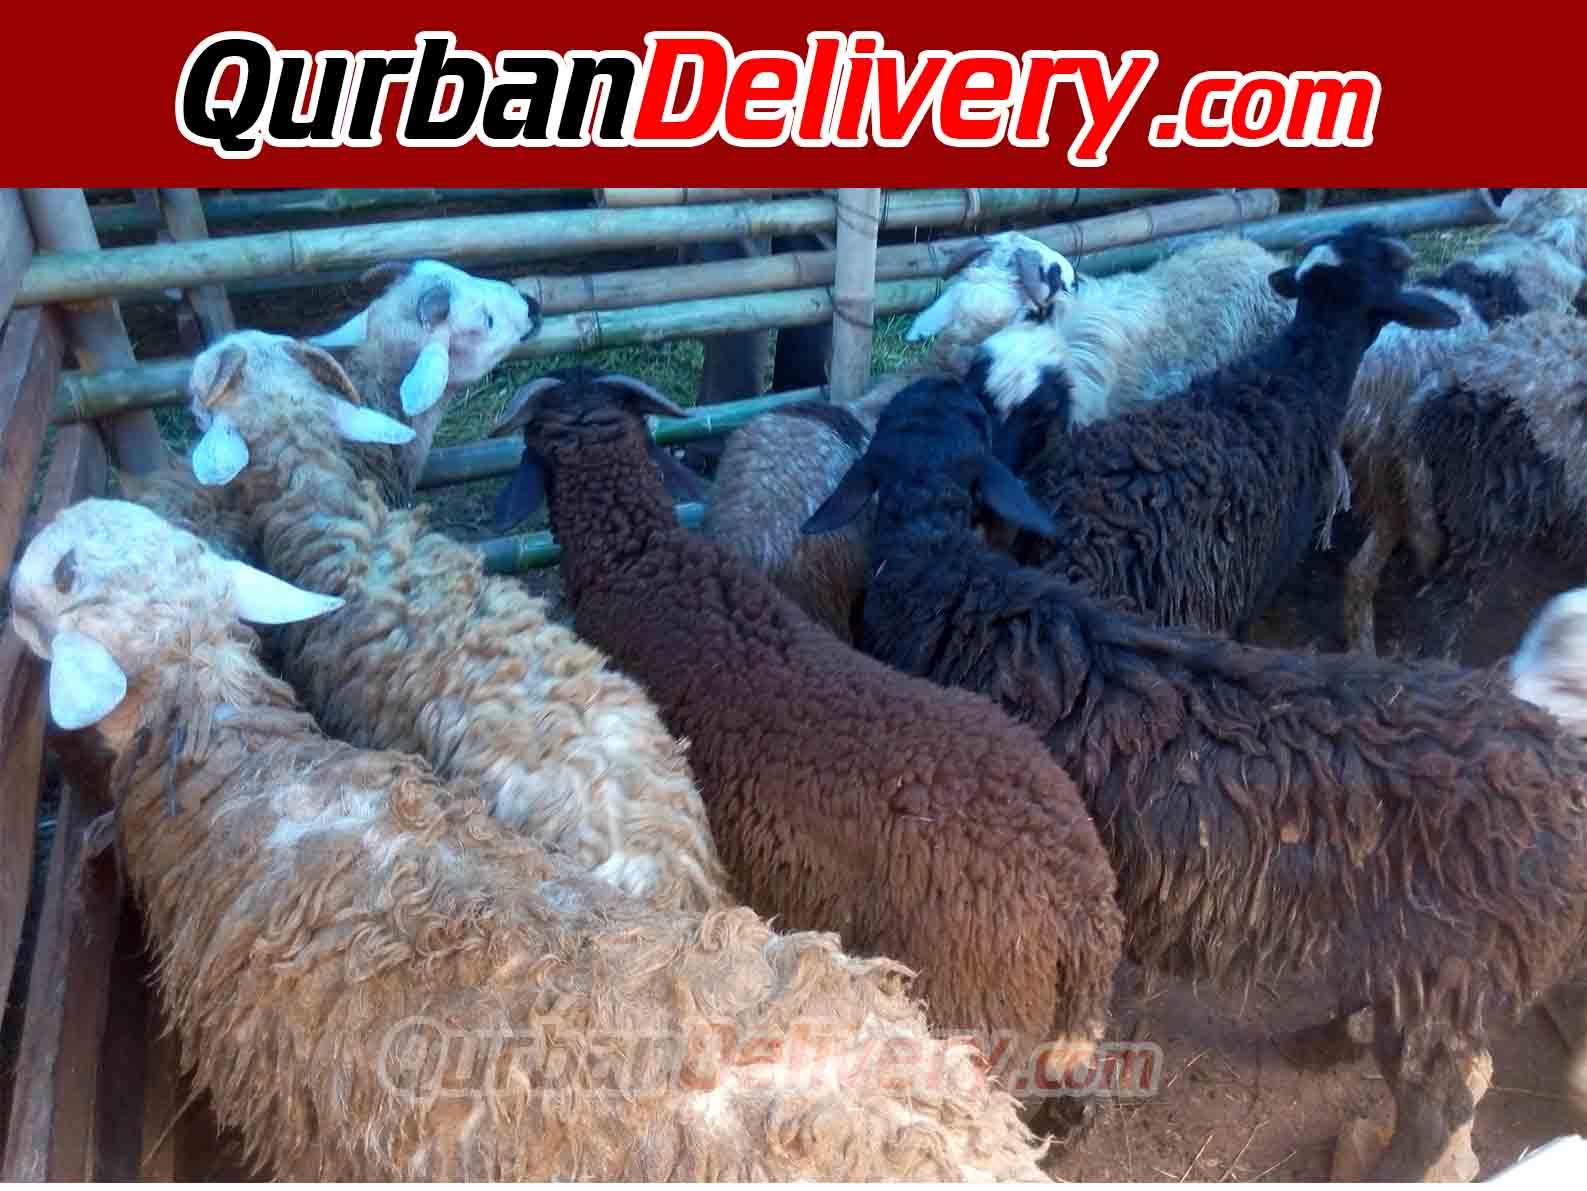 Harga Sapi Limosin Qurban Per Kg Prediksi 2020-Qurban Delivery